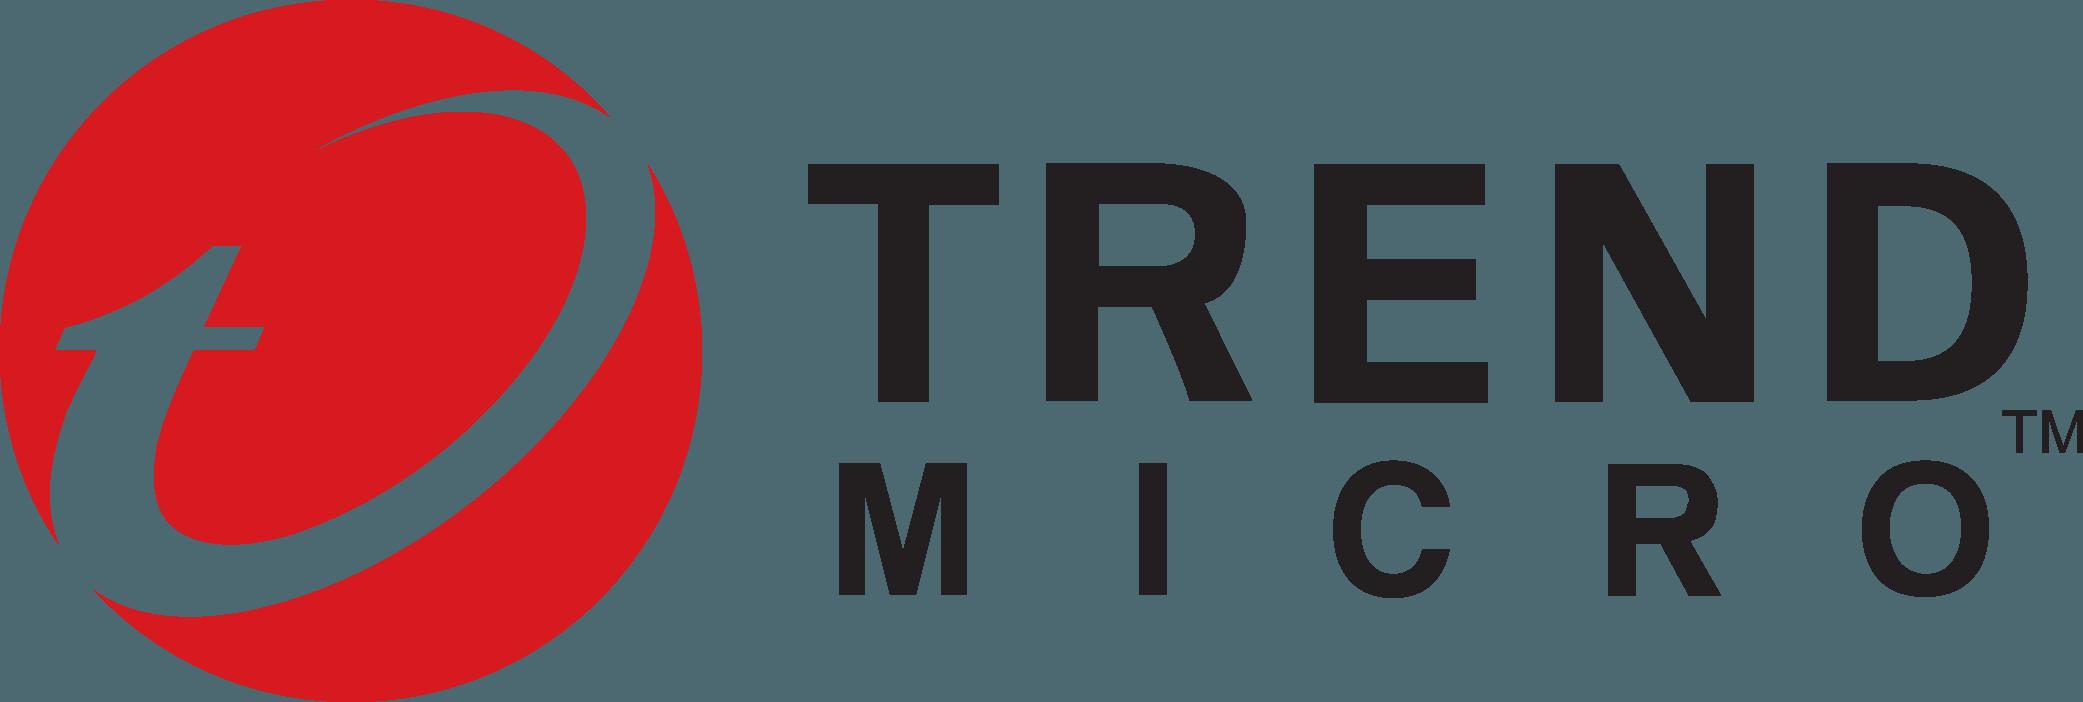 Trend Micro Logo Download Vector.